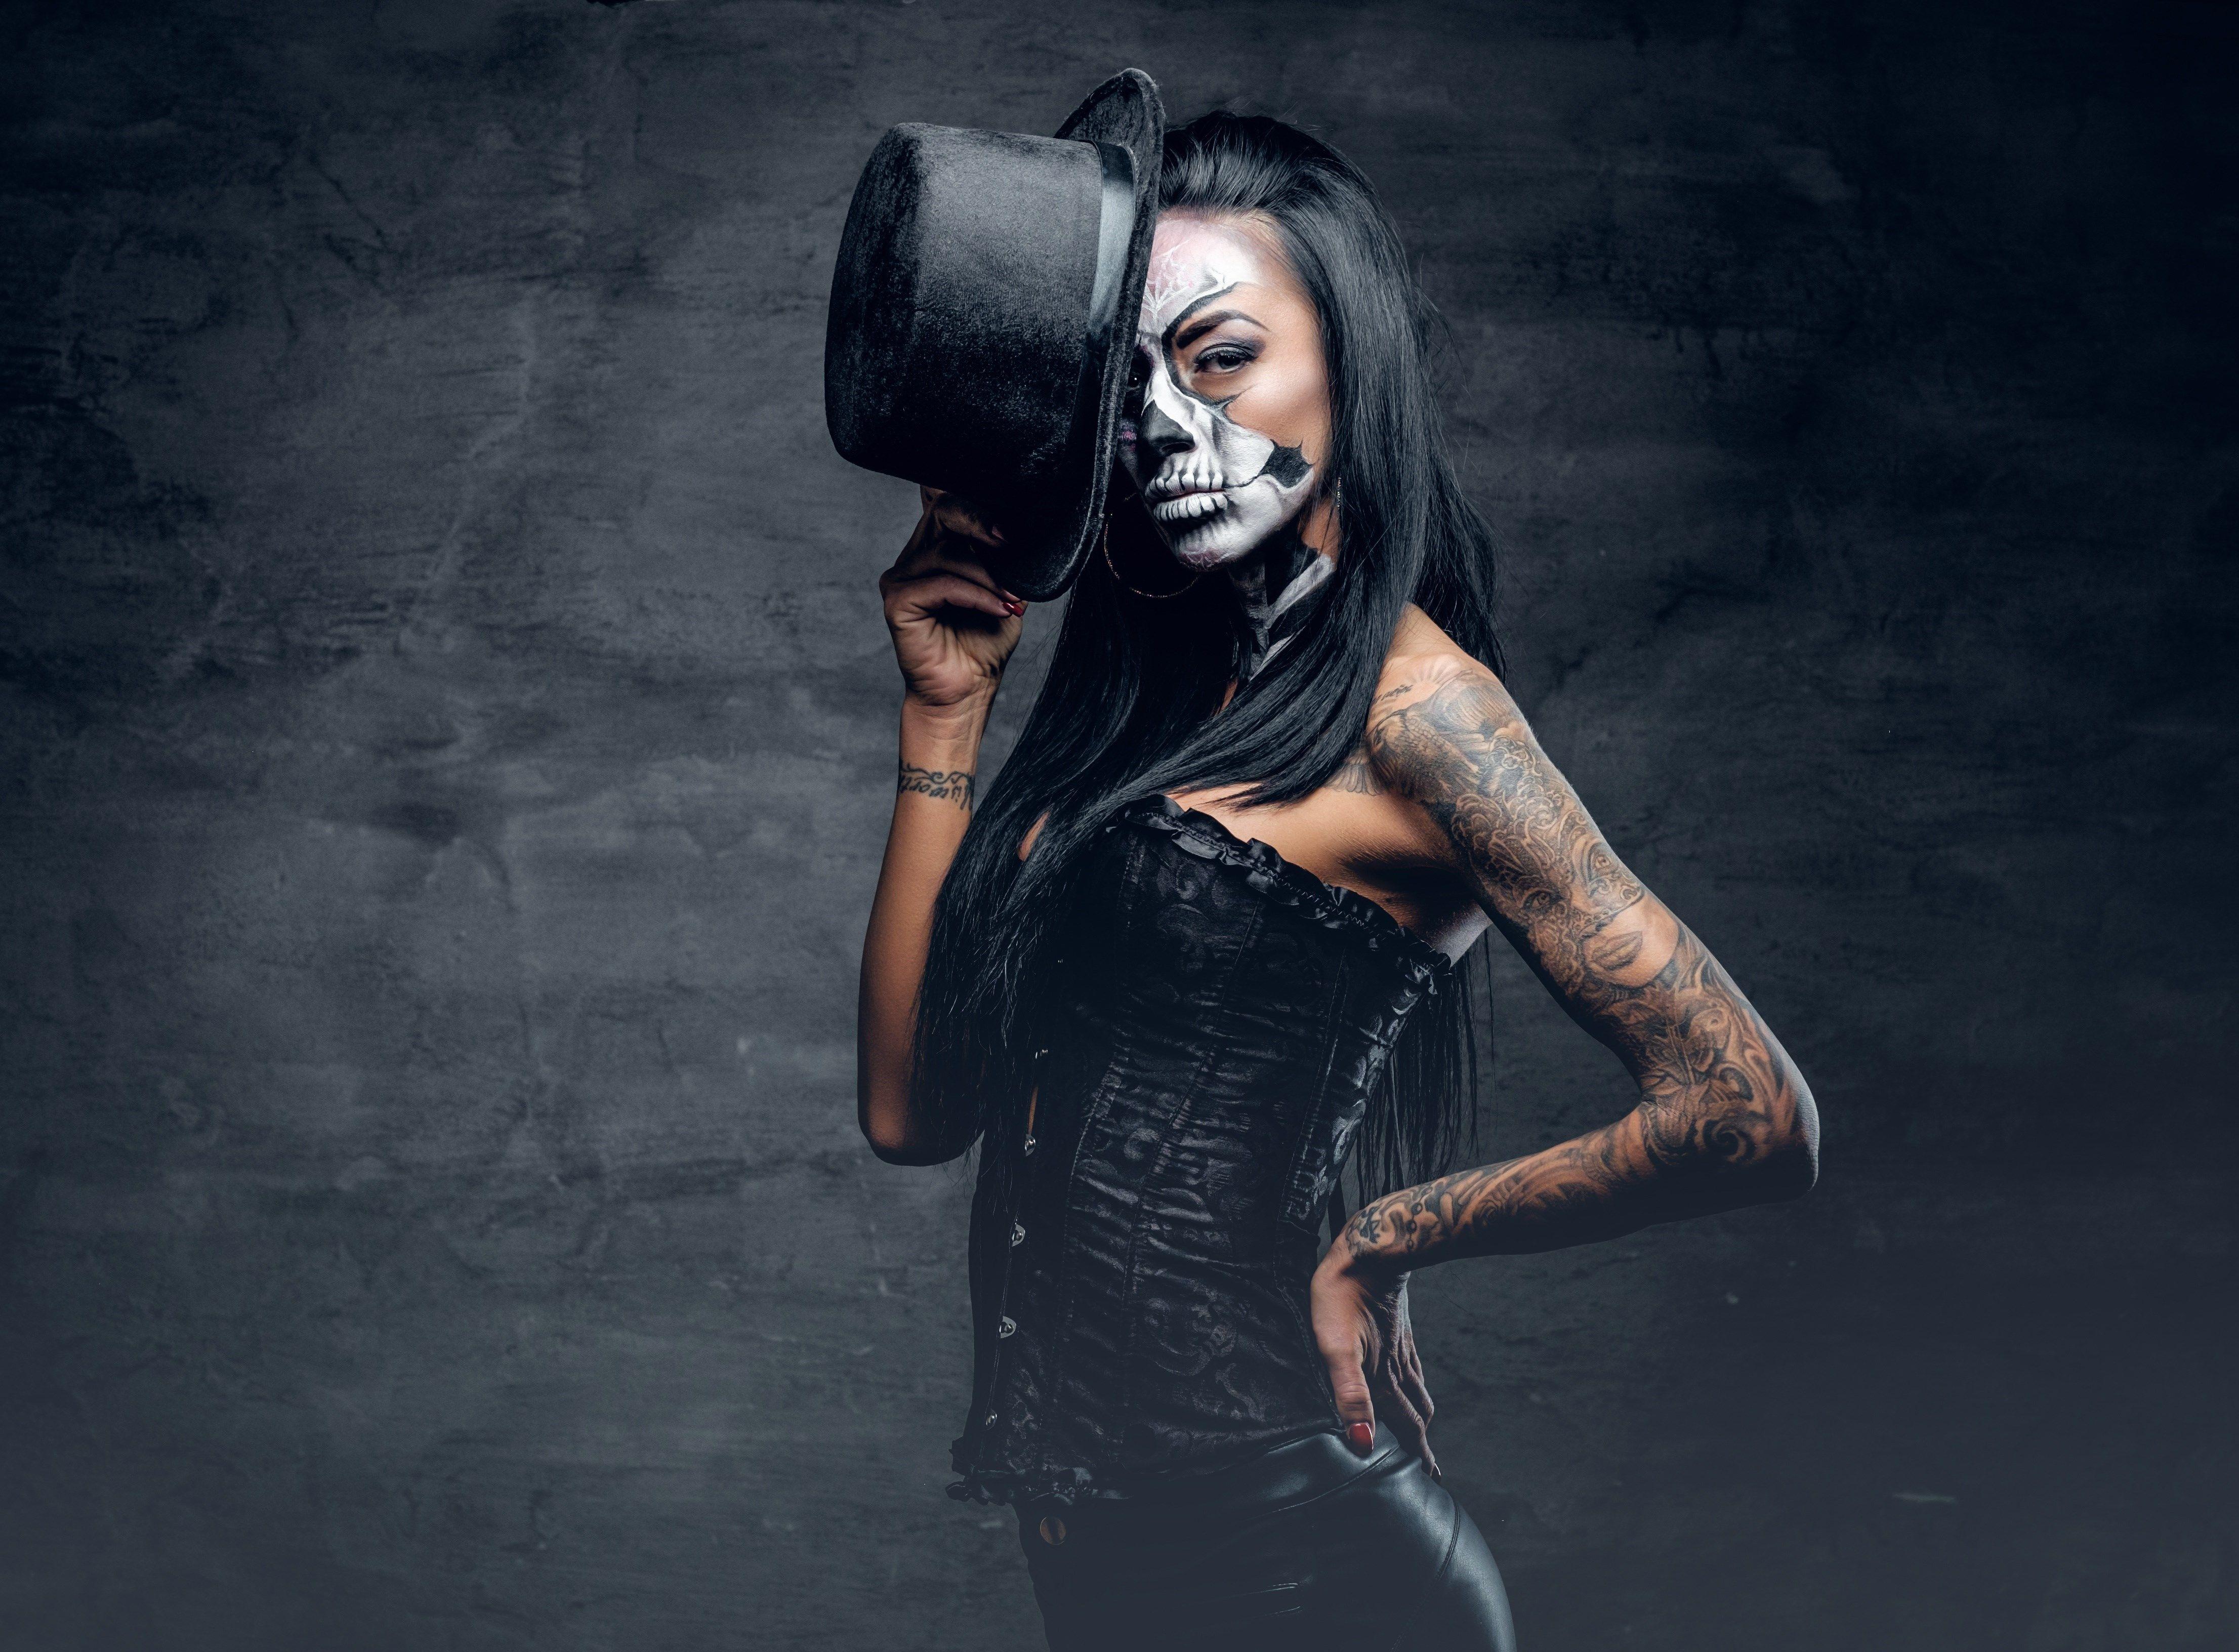 Tattoo 4k Wallpaper 4424x3264 Skull Makeup Halloween